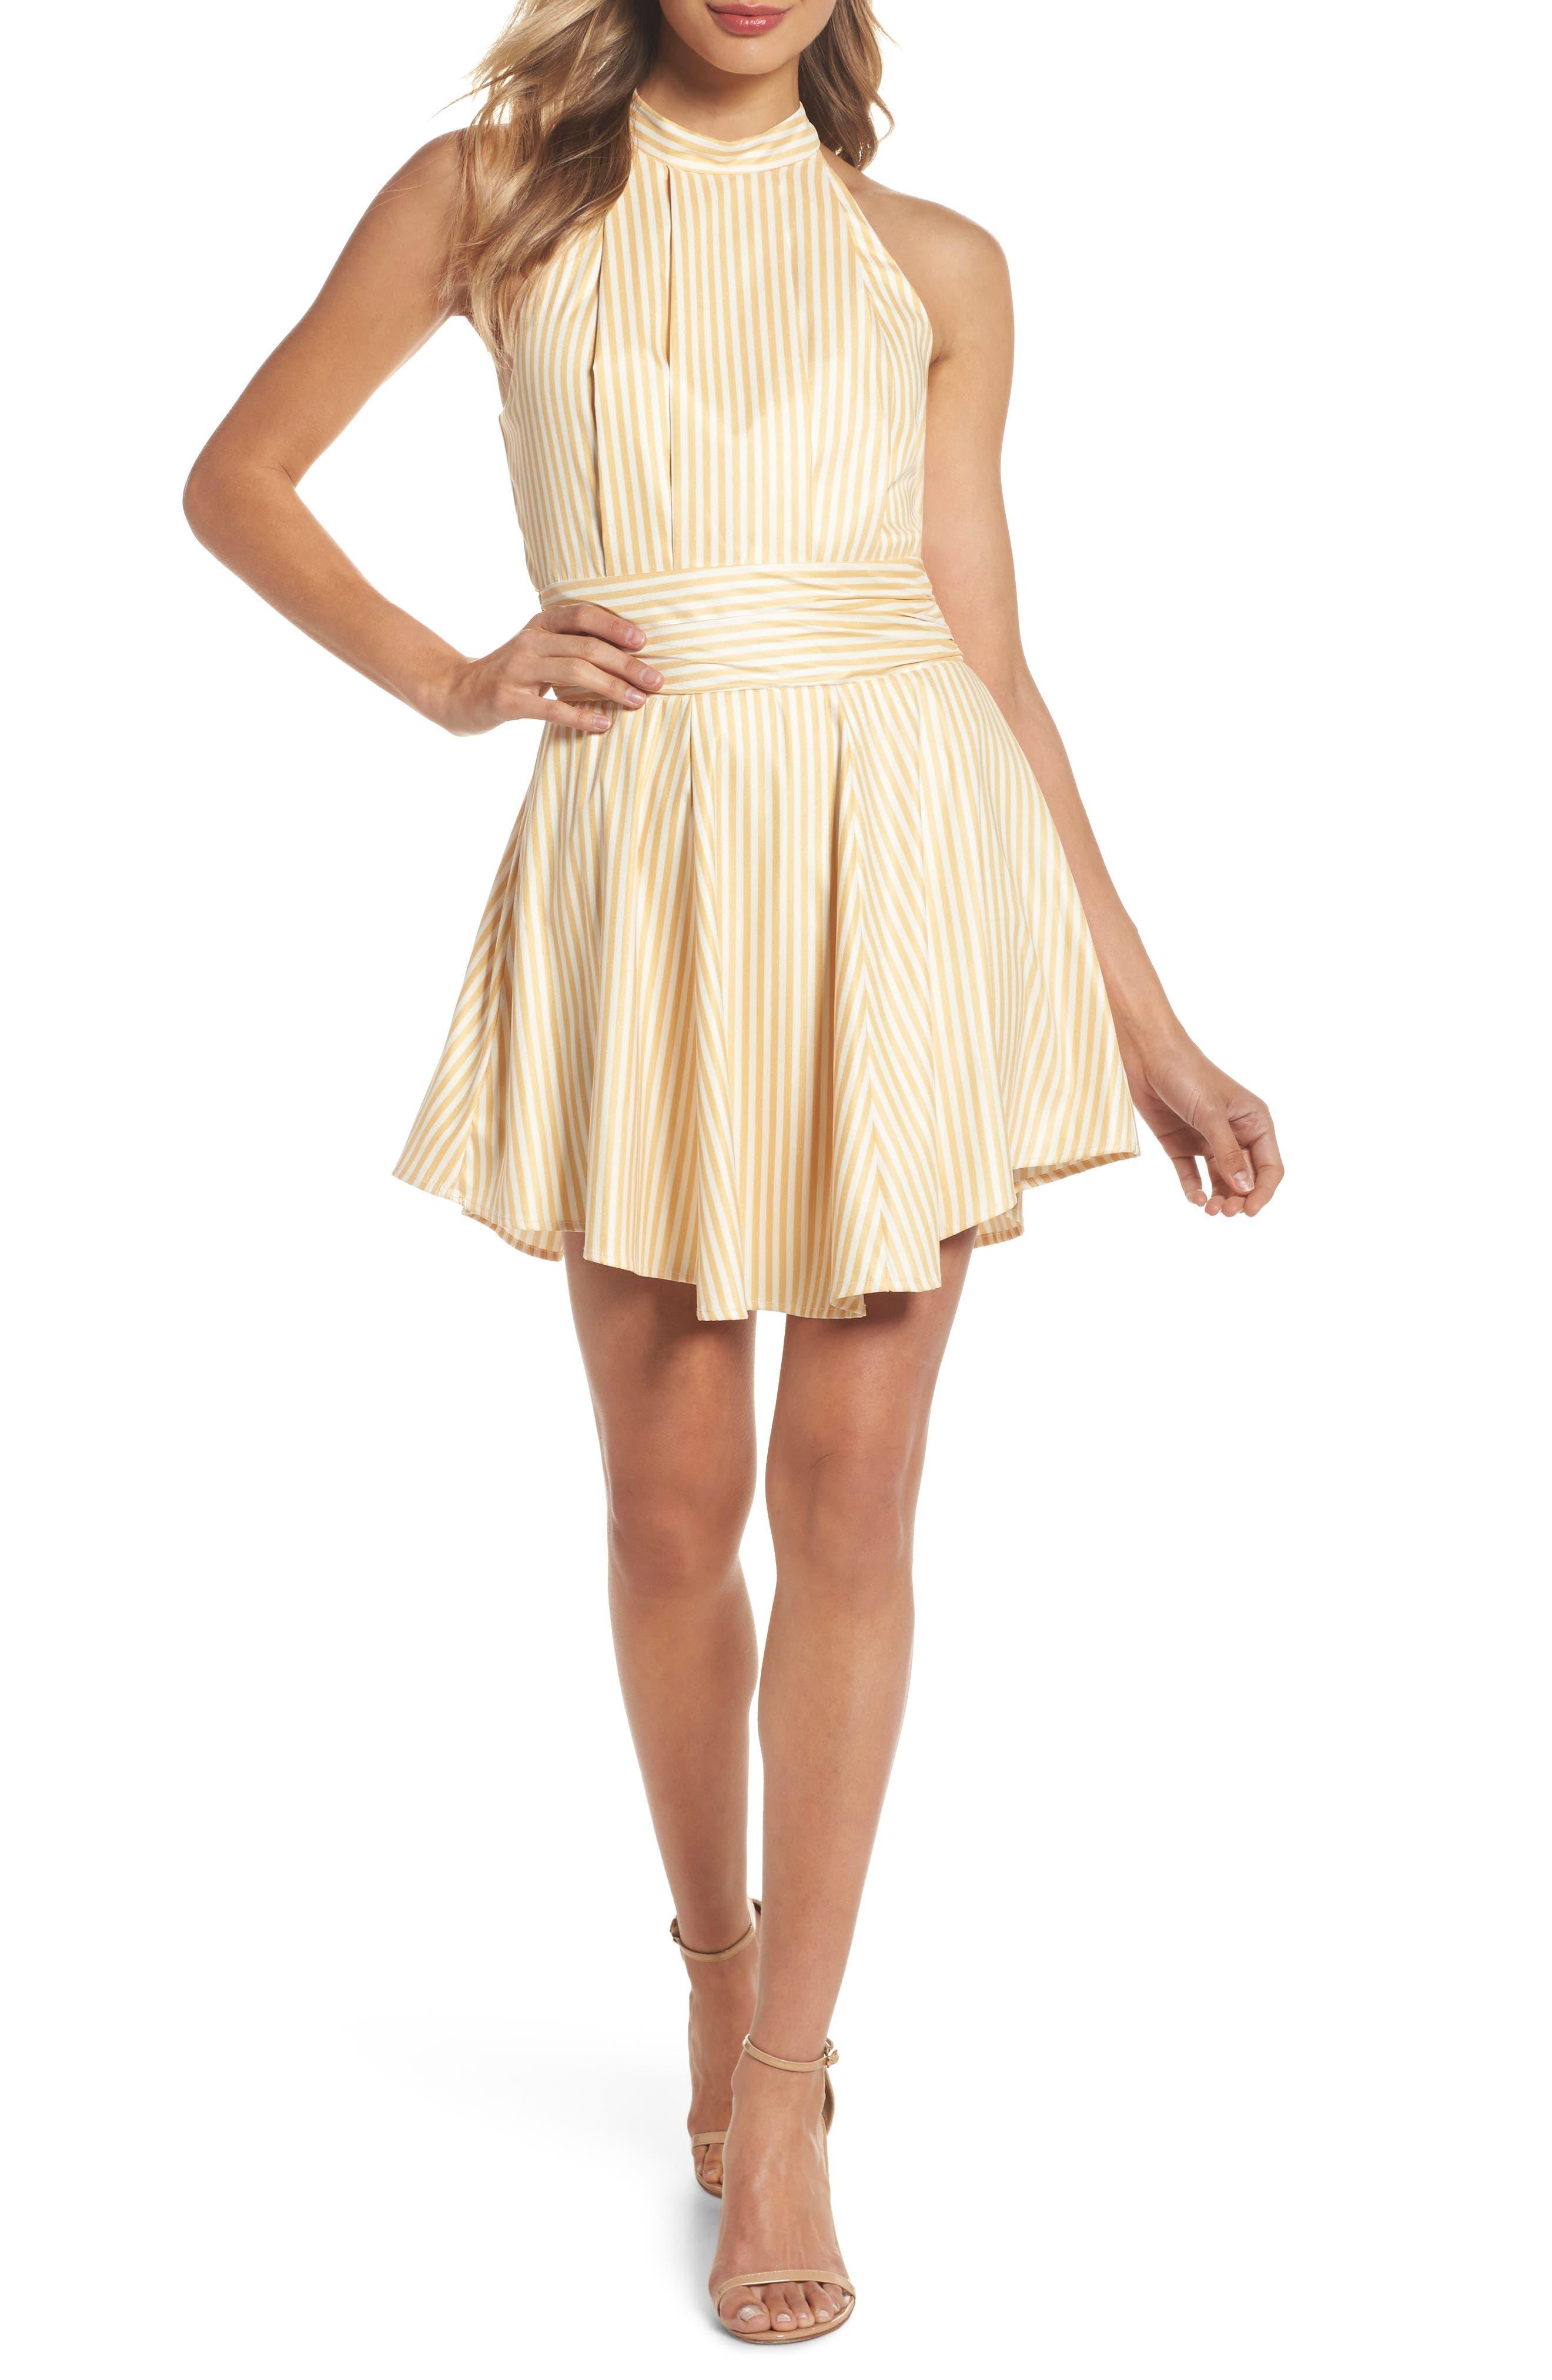 Believe in Me Halter Neck Party Dress,                             Main thumbnail 1, color,                             Honey Stripe